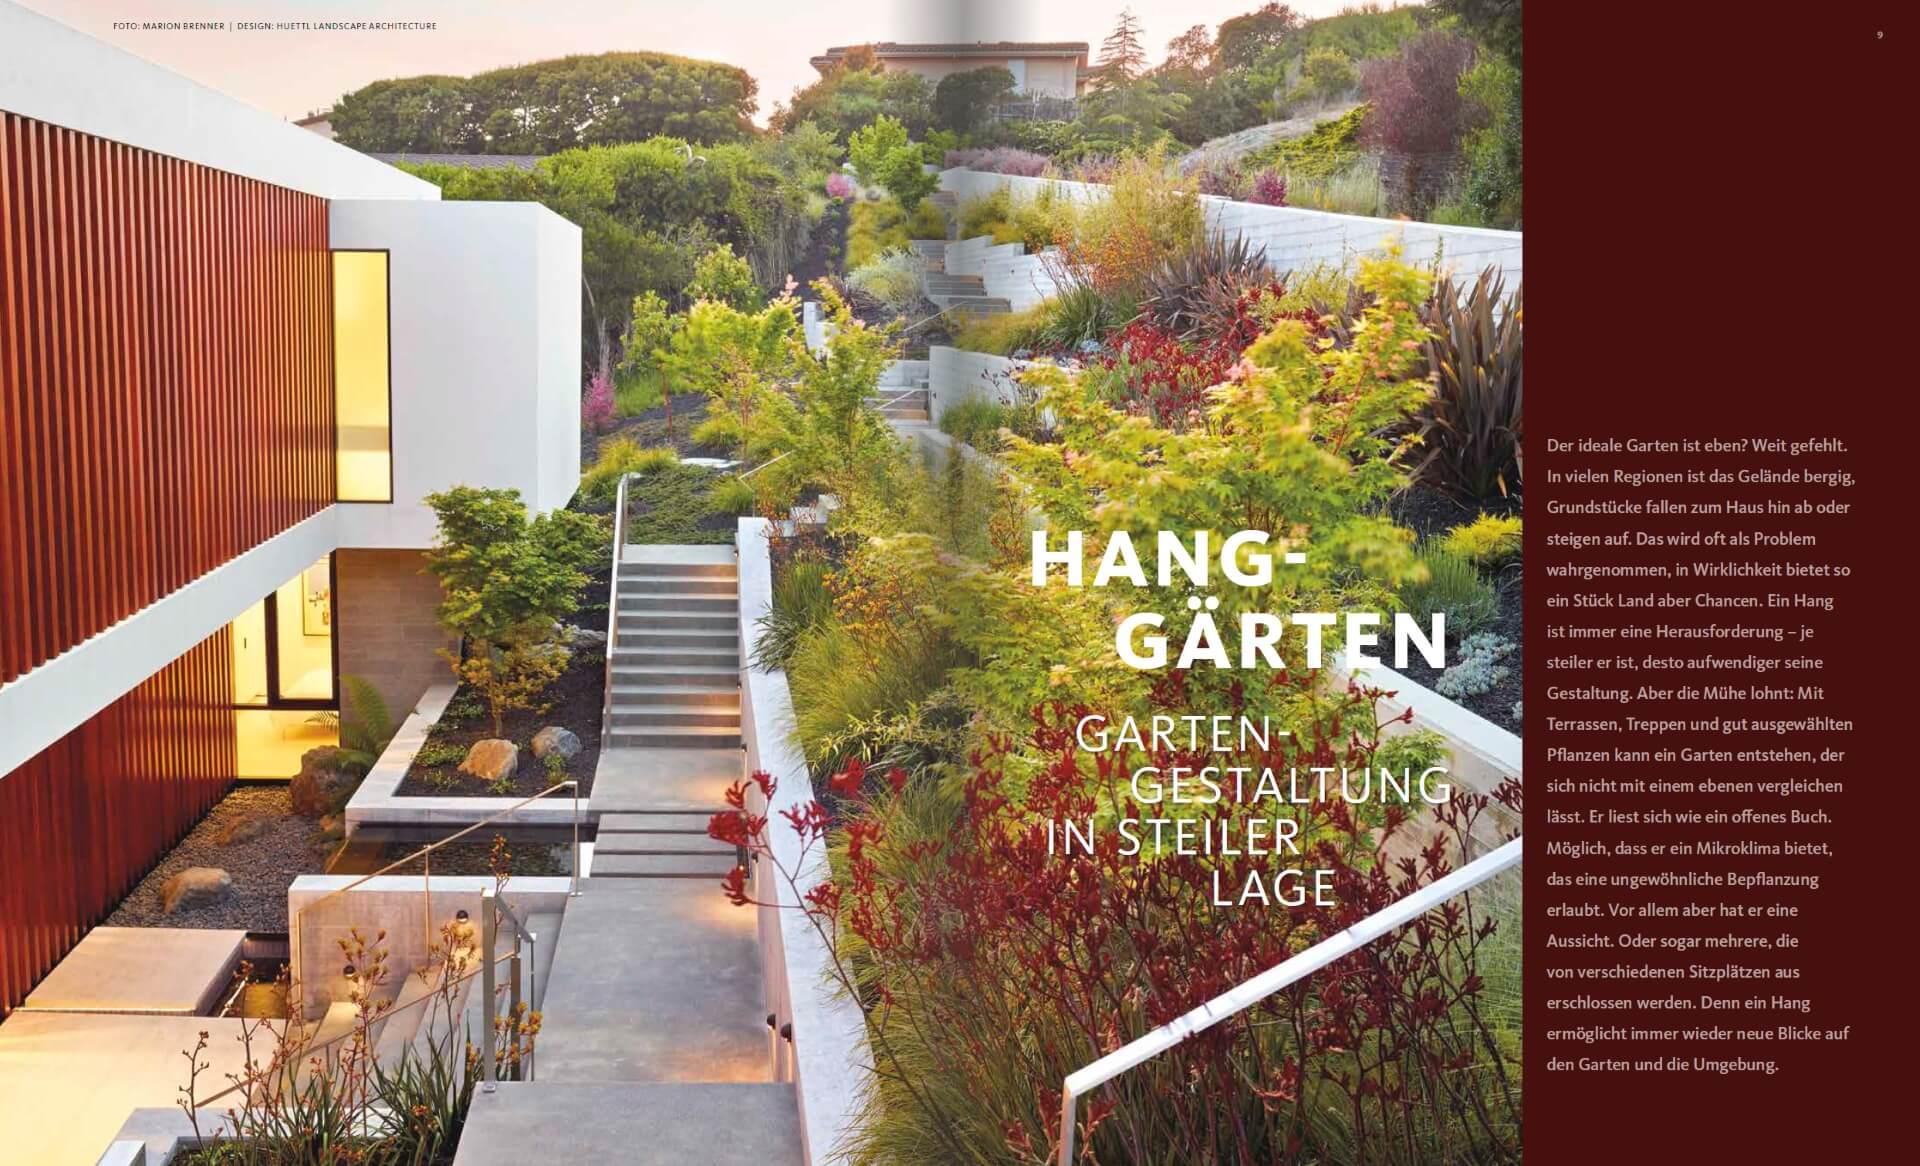 Hanggarten Gartengestaltung In Steiler Lage Gd Inspiration De